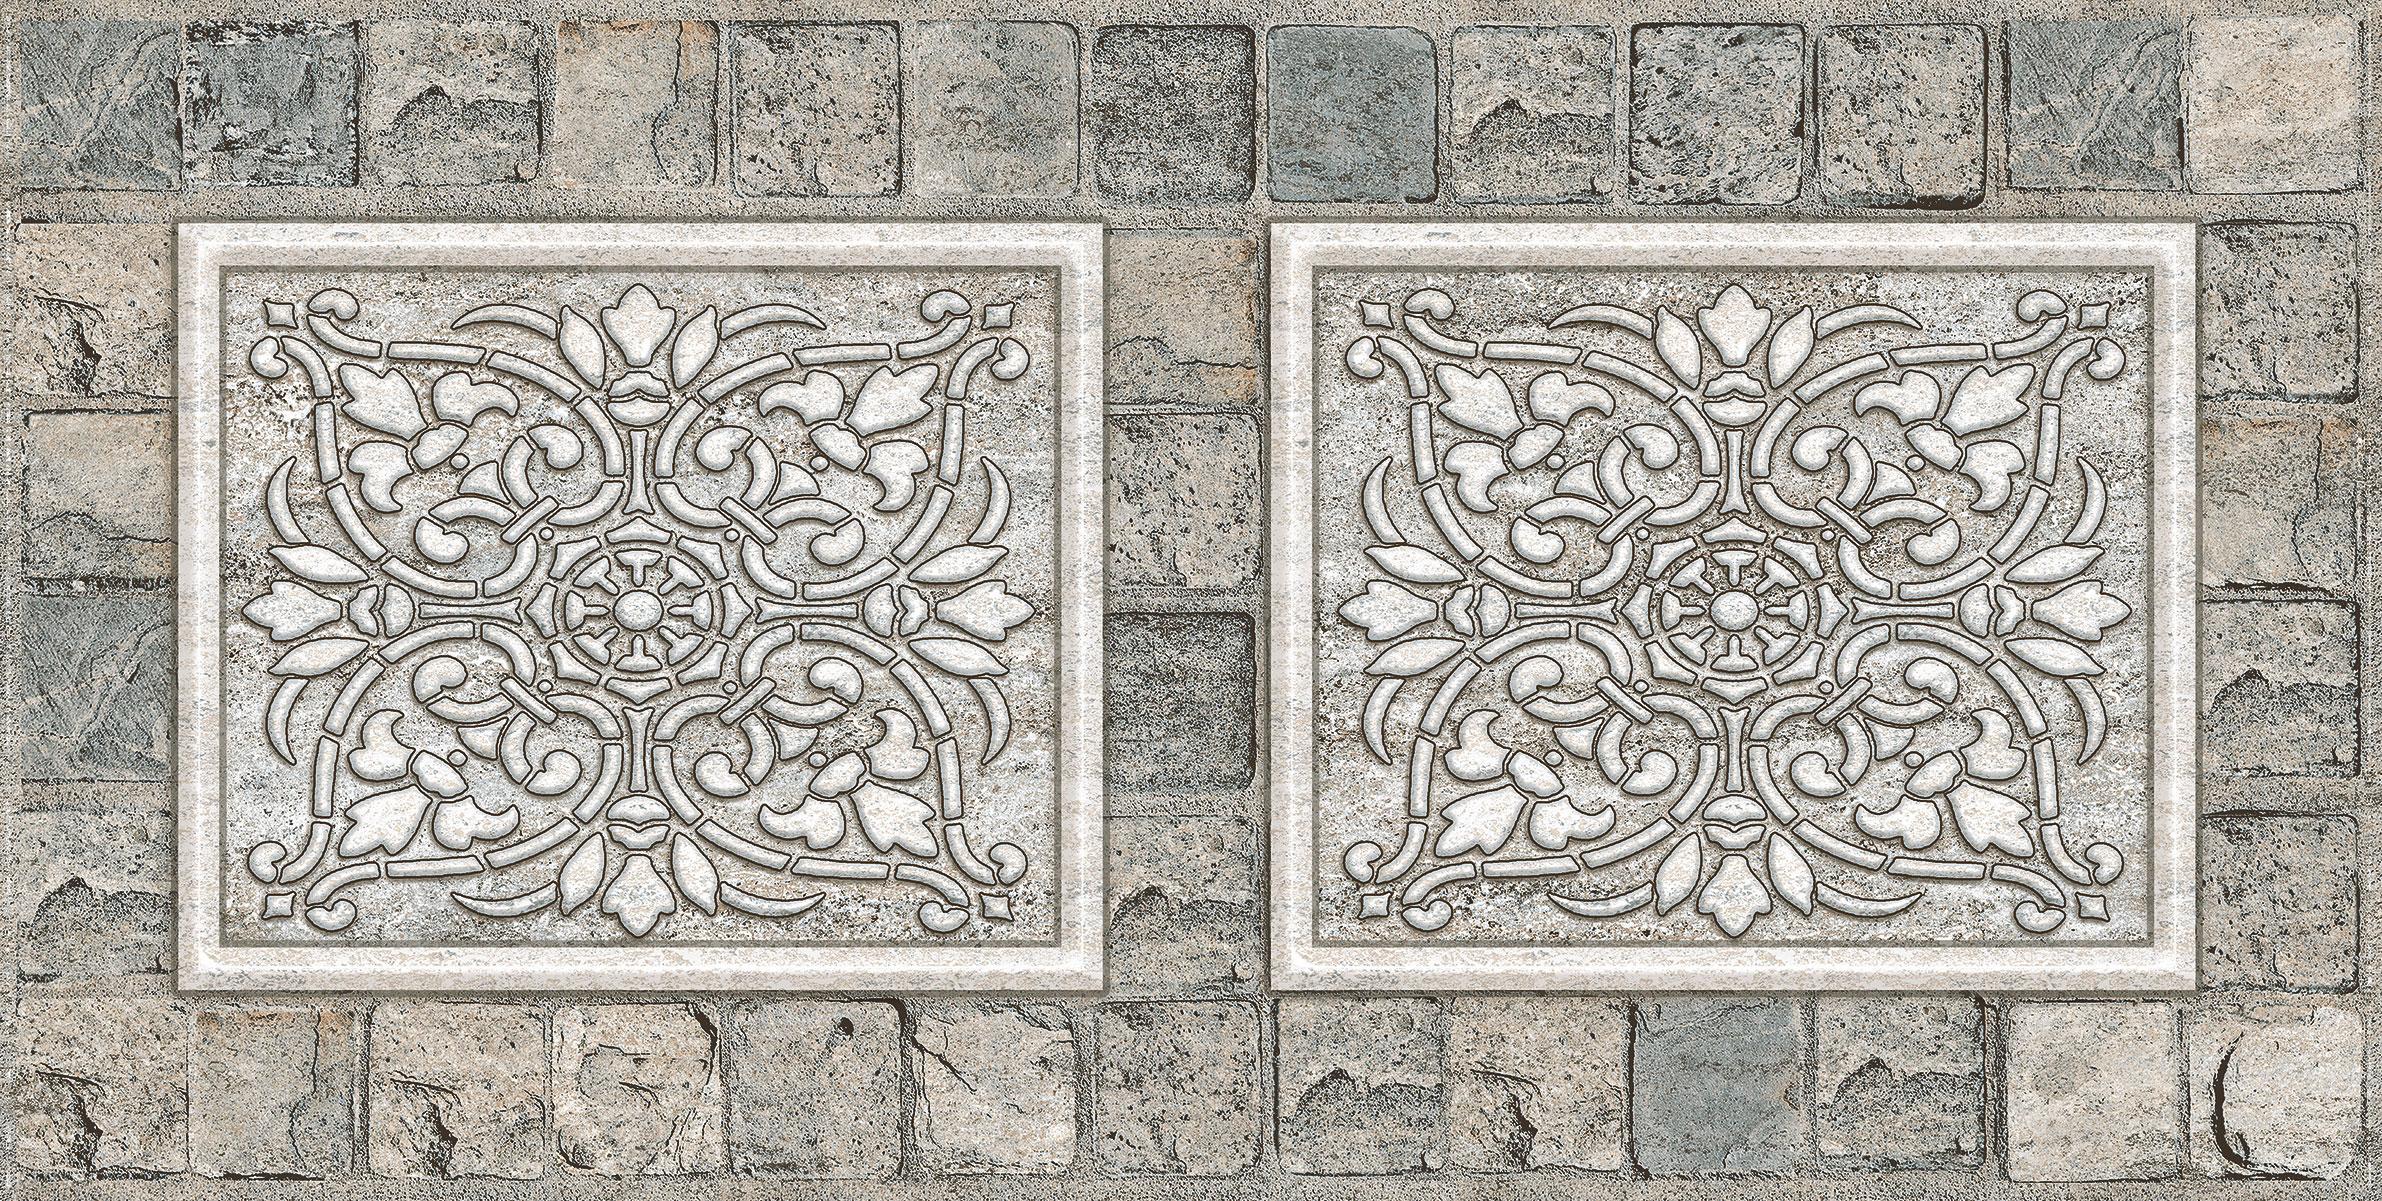 Edmonton Highlighter Digital 30x60 Cm Wall Tiles